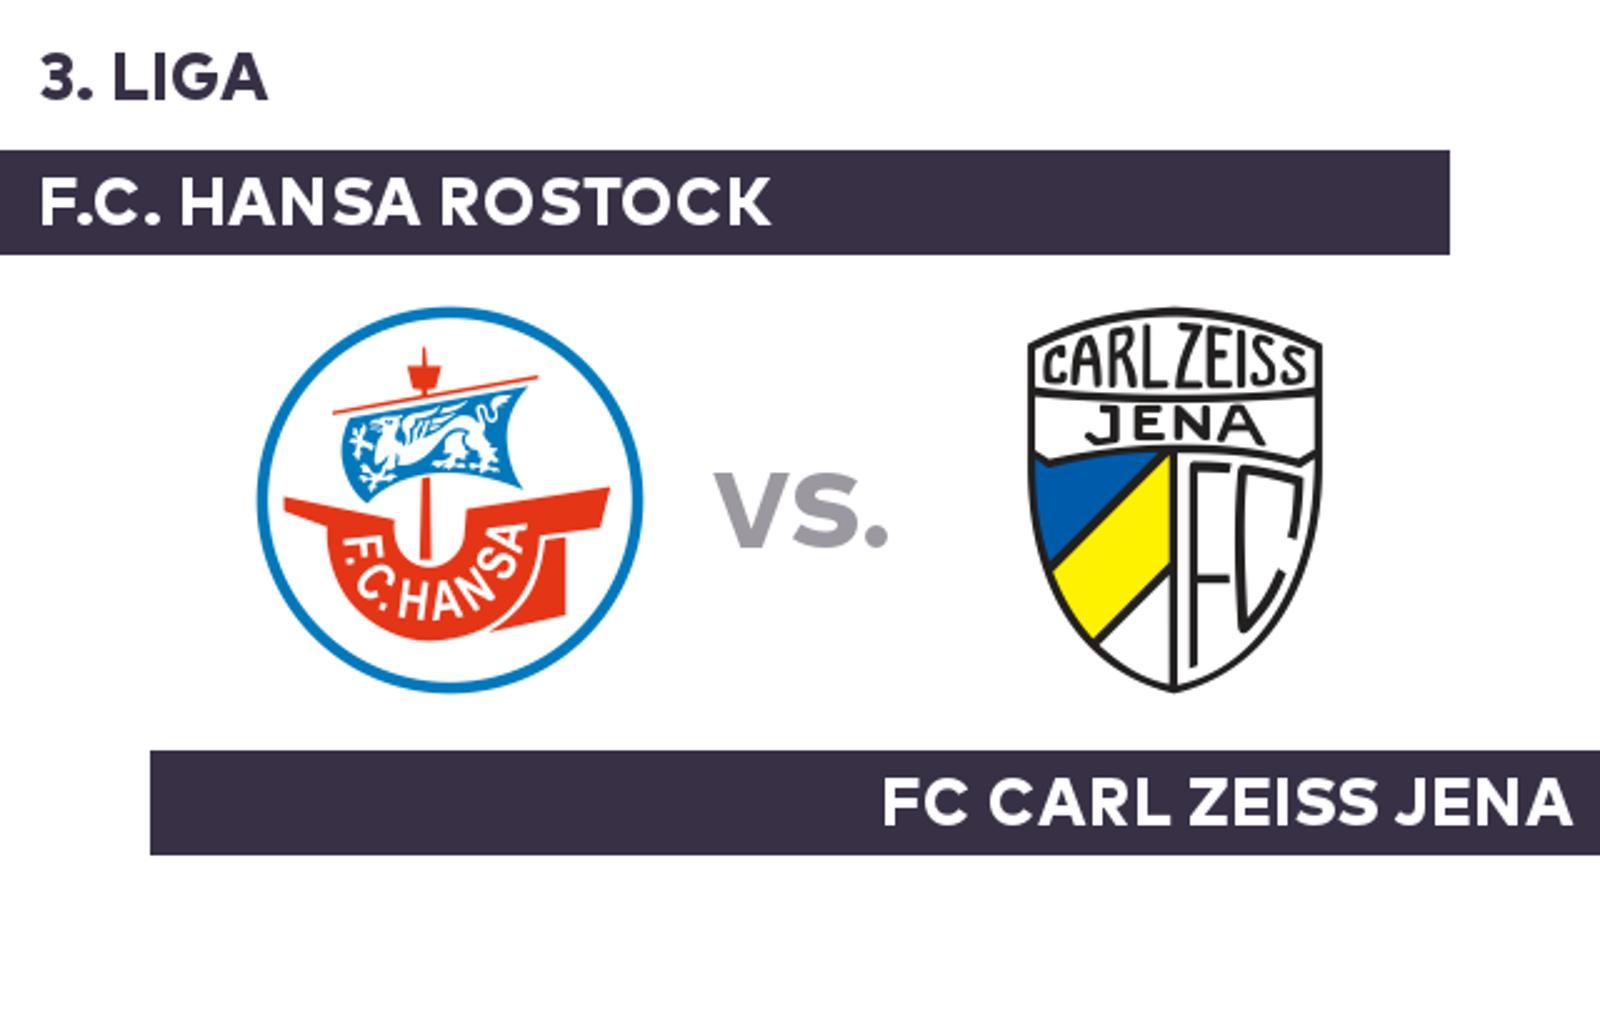 F.C. Hansa Rostock - FC Carl Zeiss Jena - Hansa Rostock ...